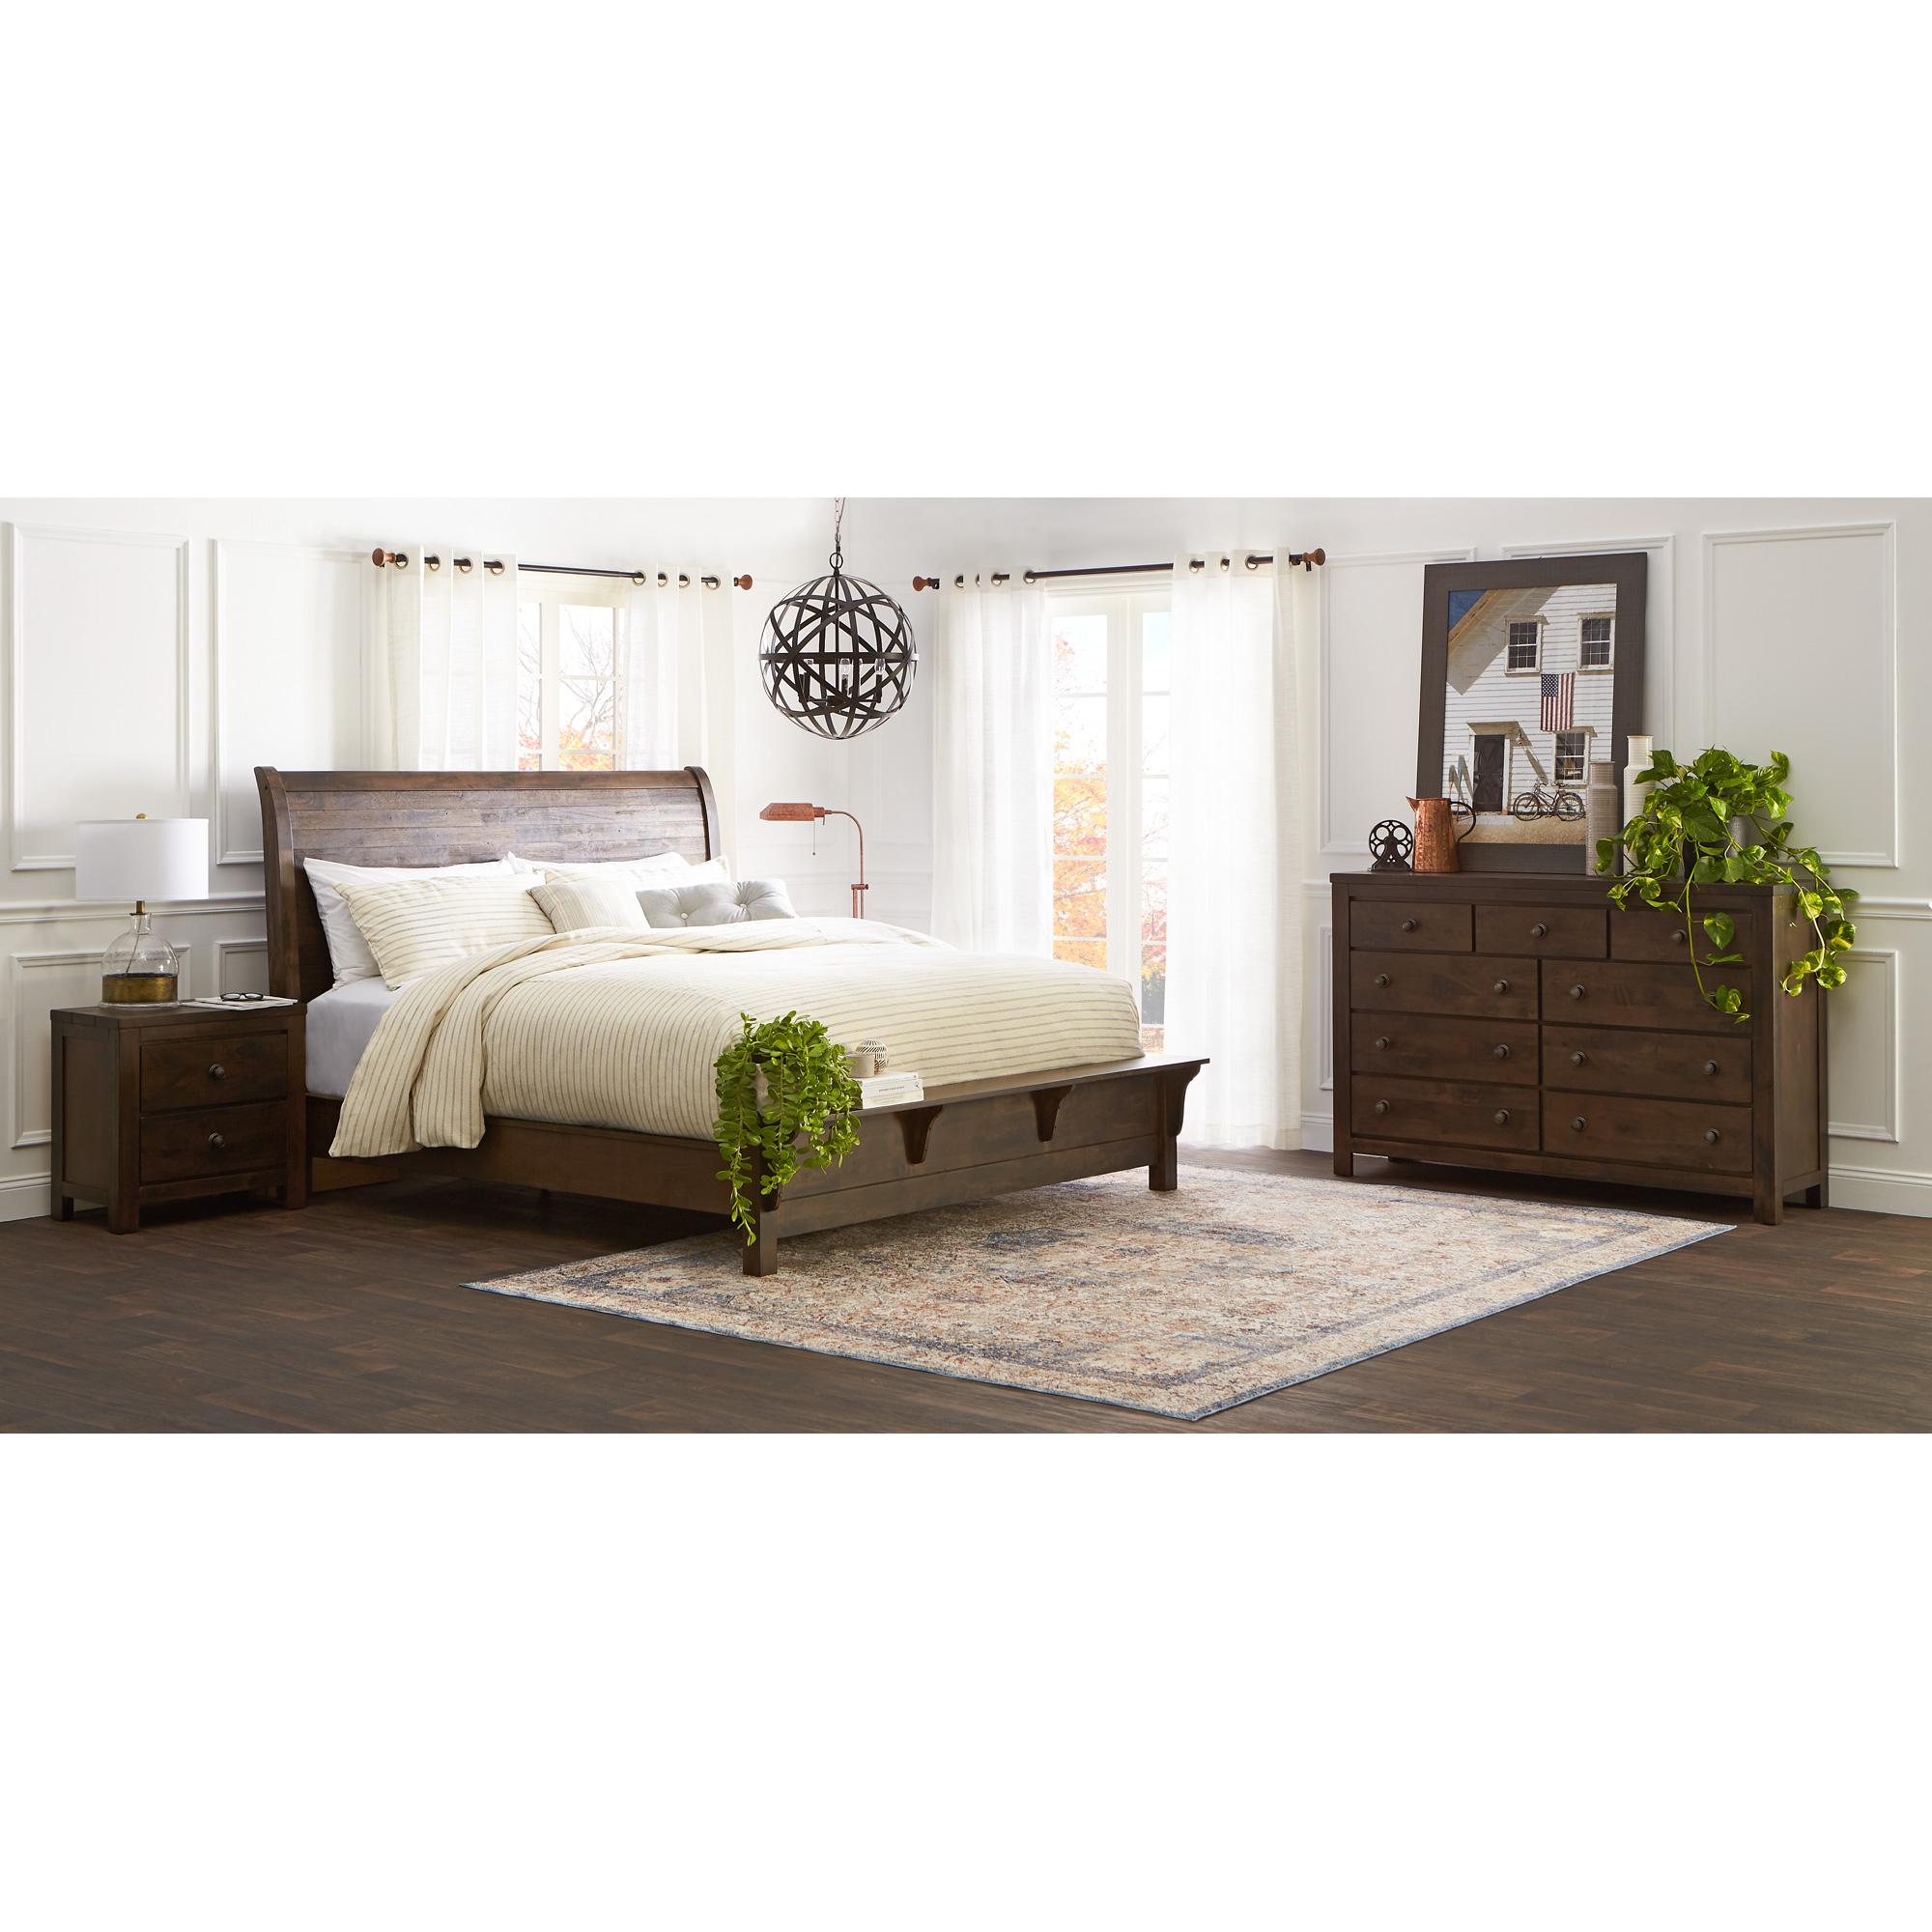 New Classic | Blue Ridge Rustic Gray California King 4 Piece Room Group Bedroom Set